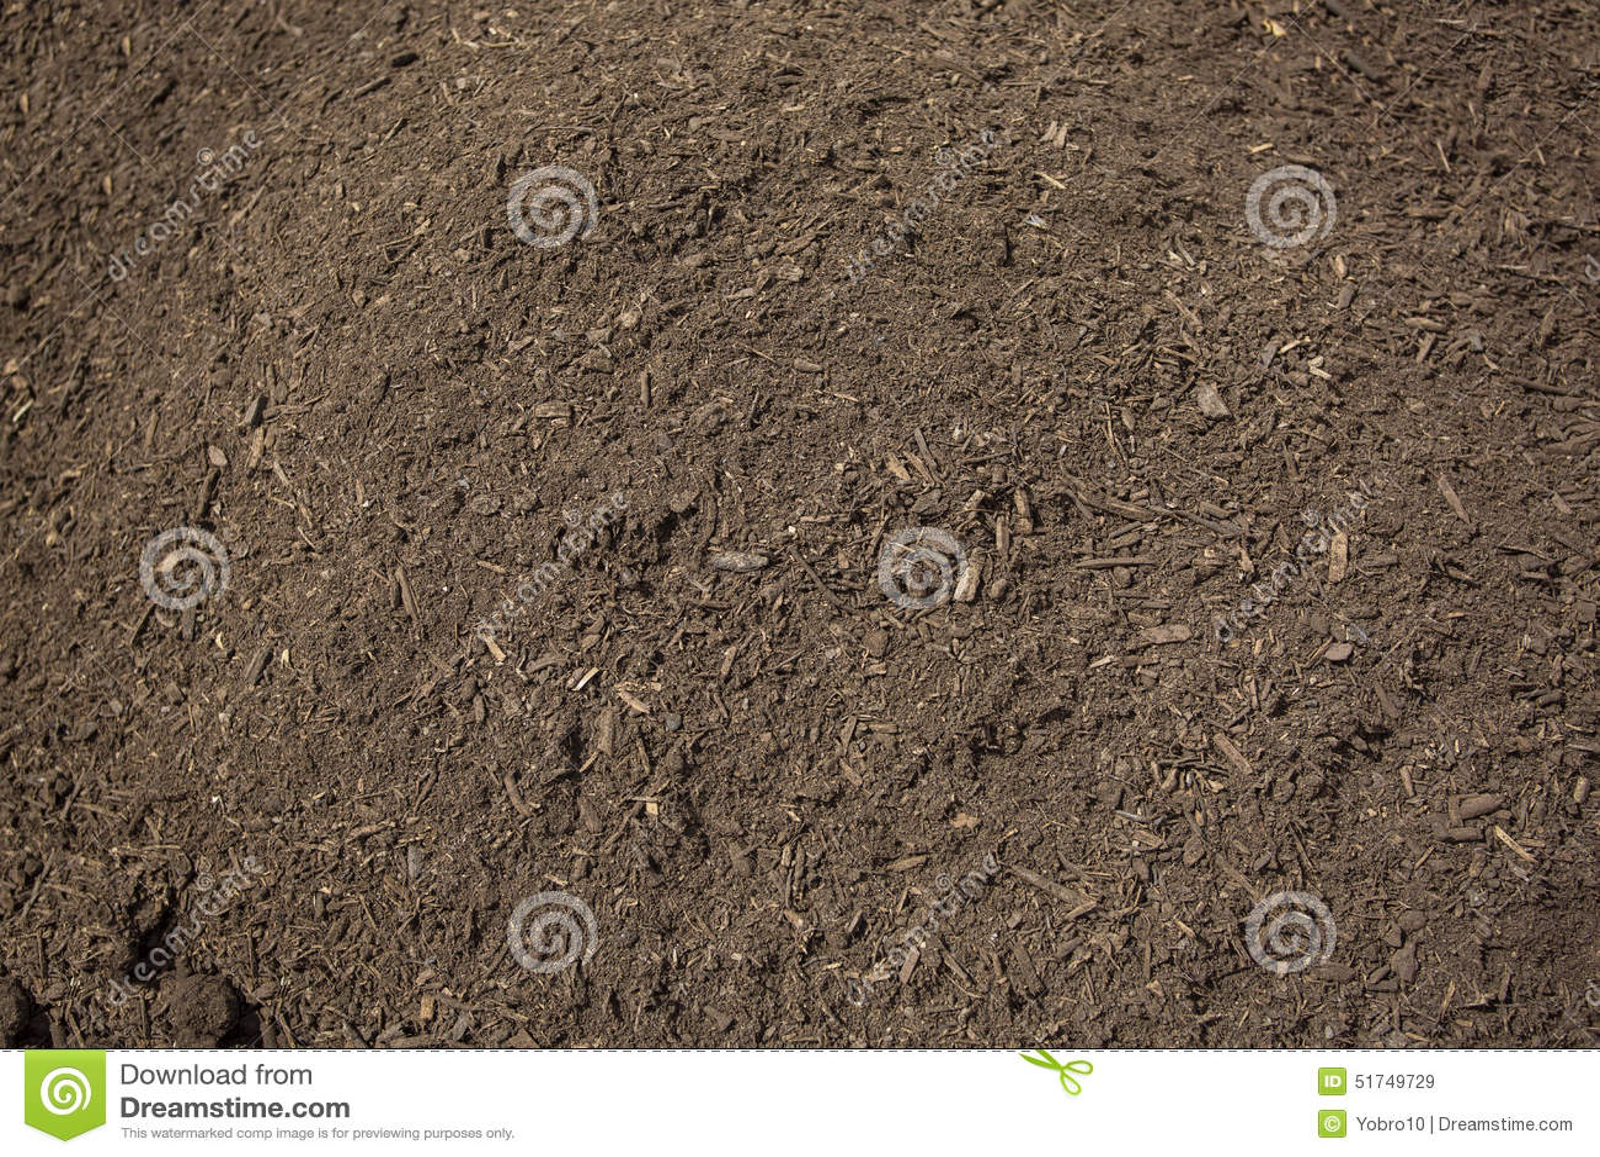 how to put nutrienta into dirt